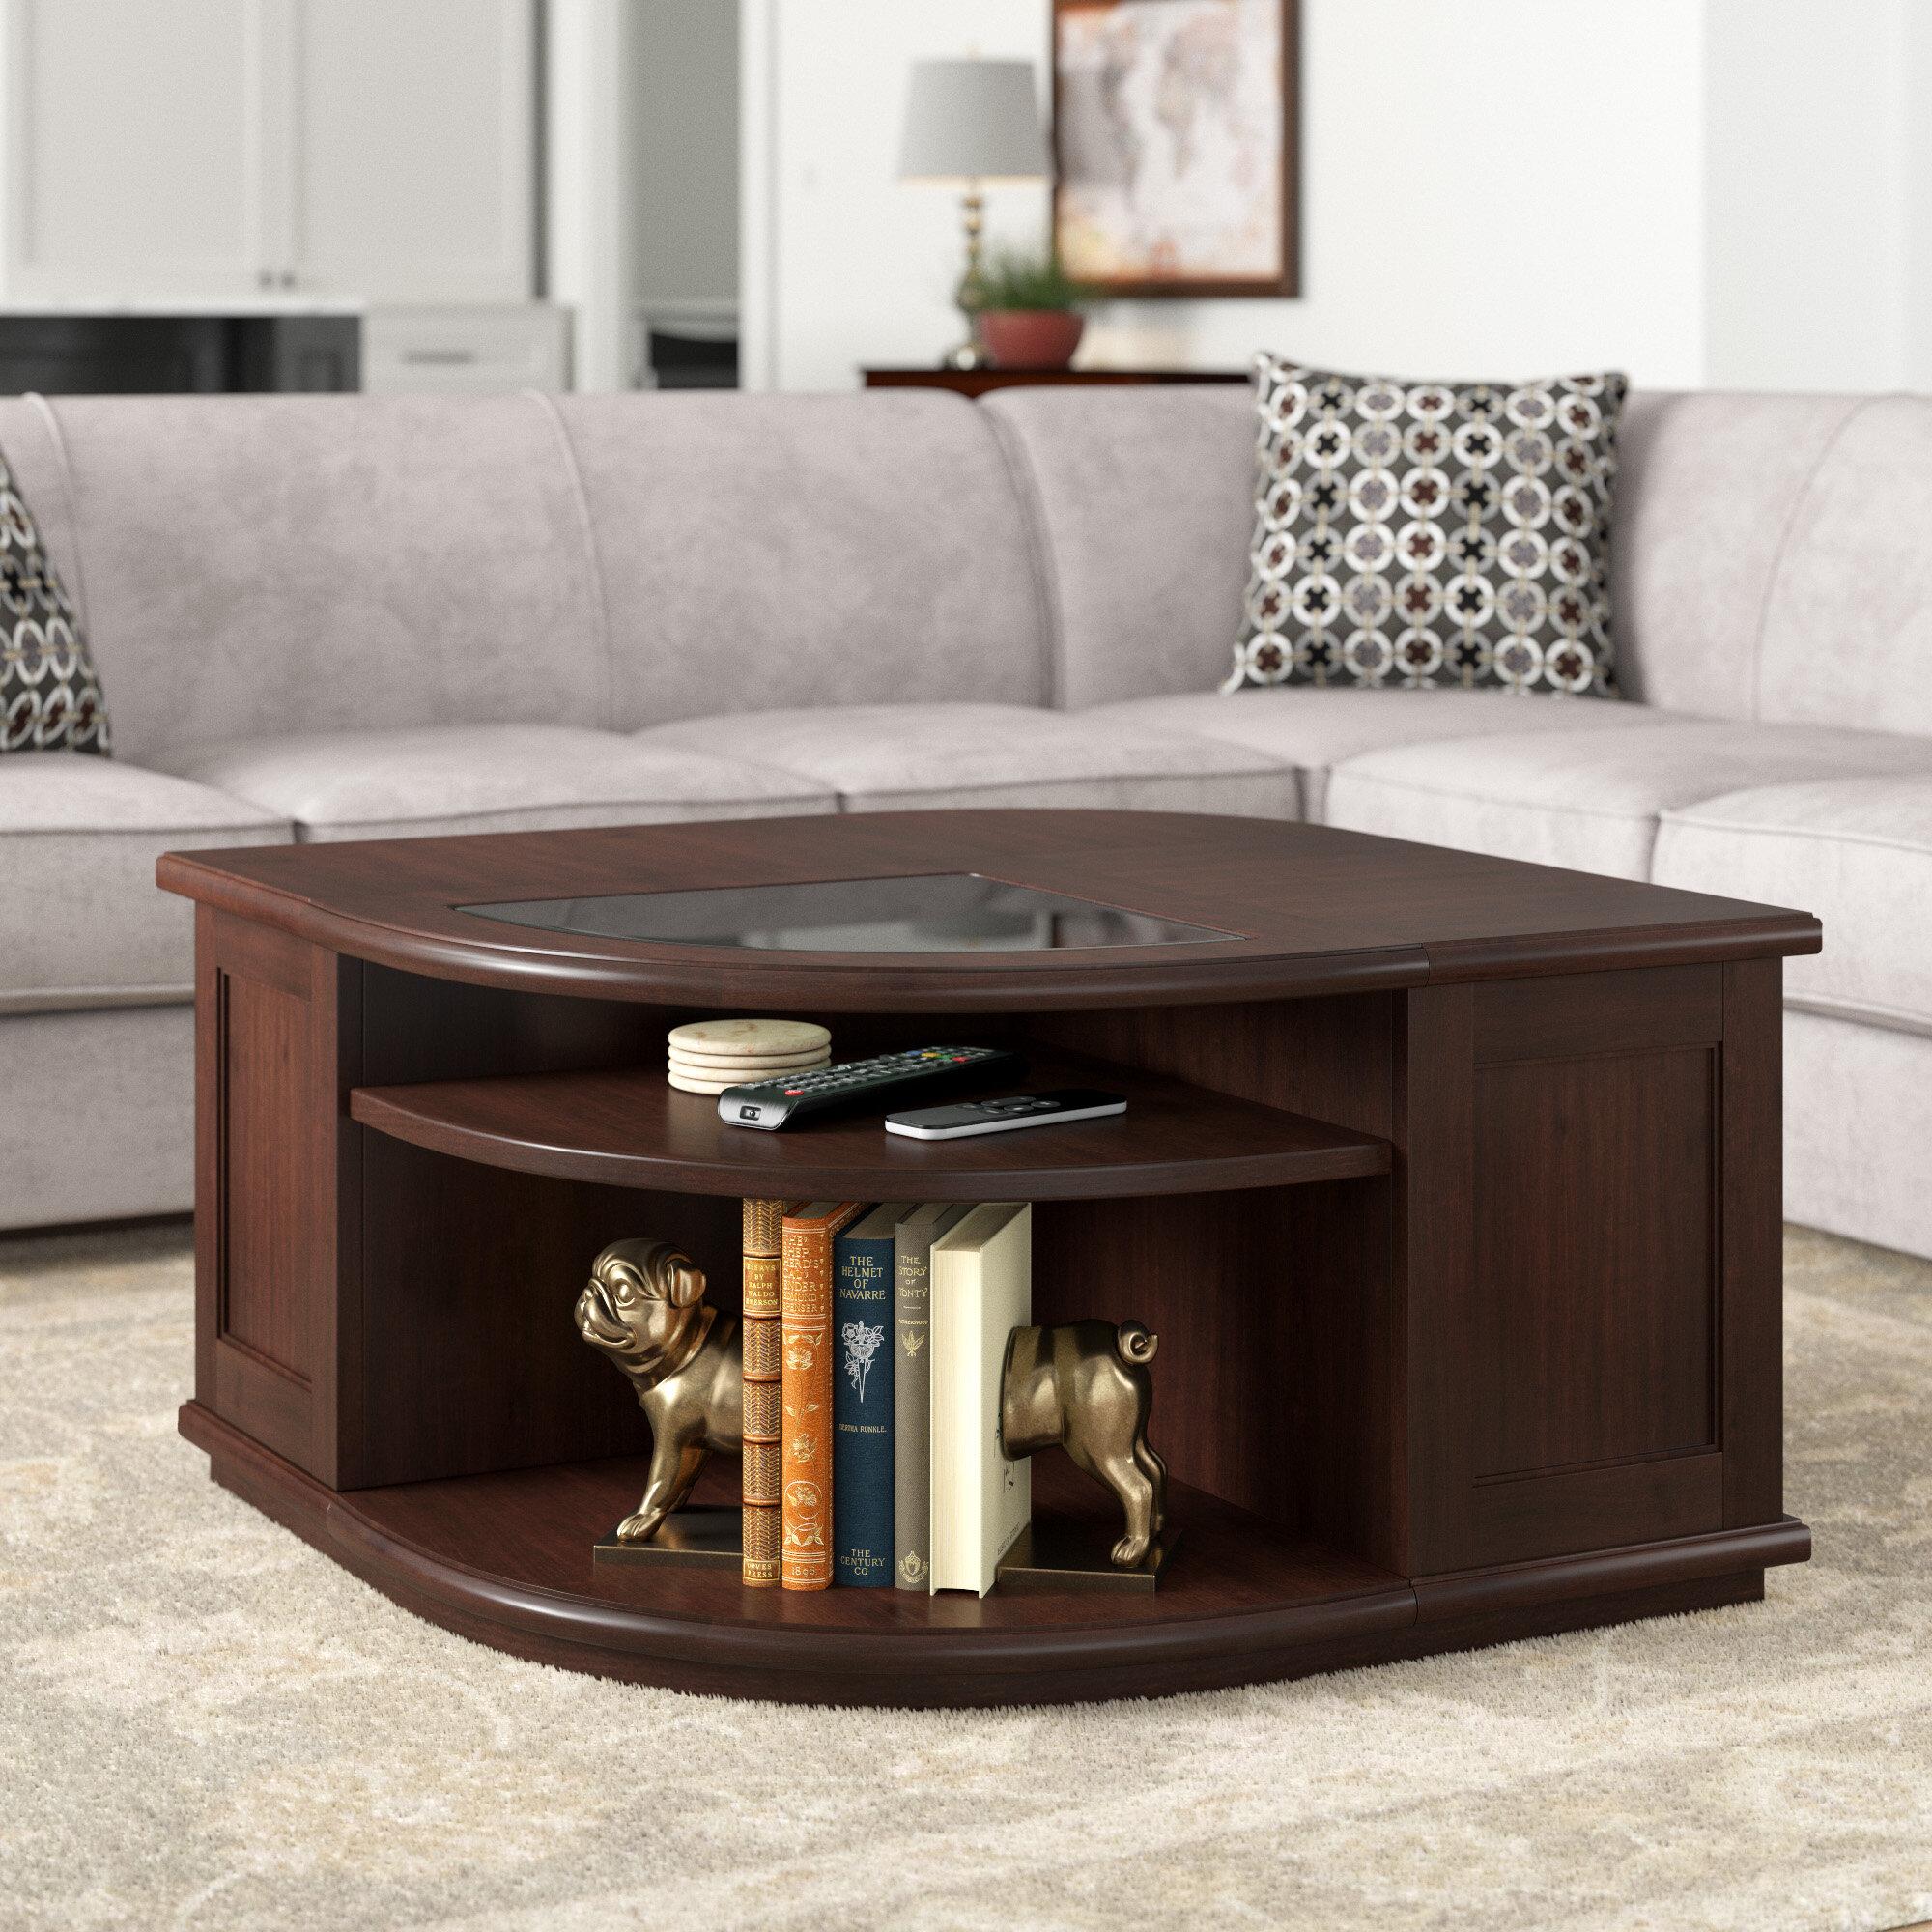 Darby Home Co Lorene Lift Top Coffee Table Reviews Wayfair